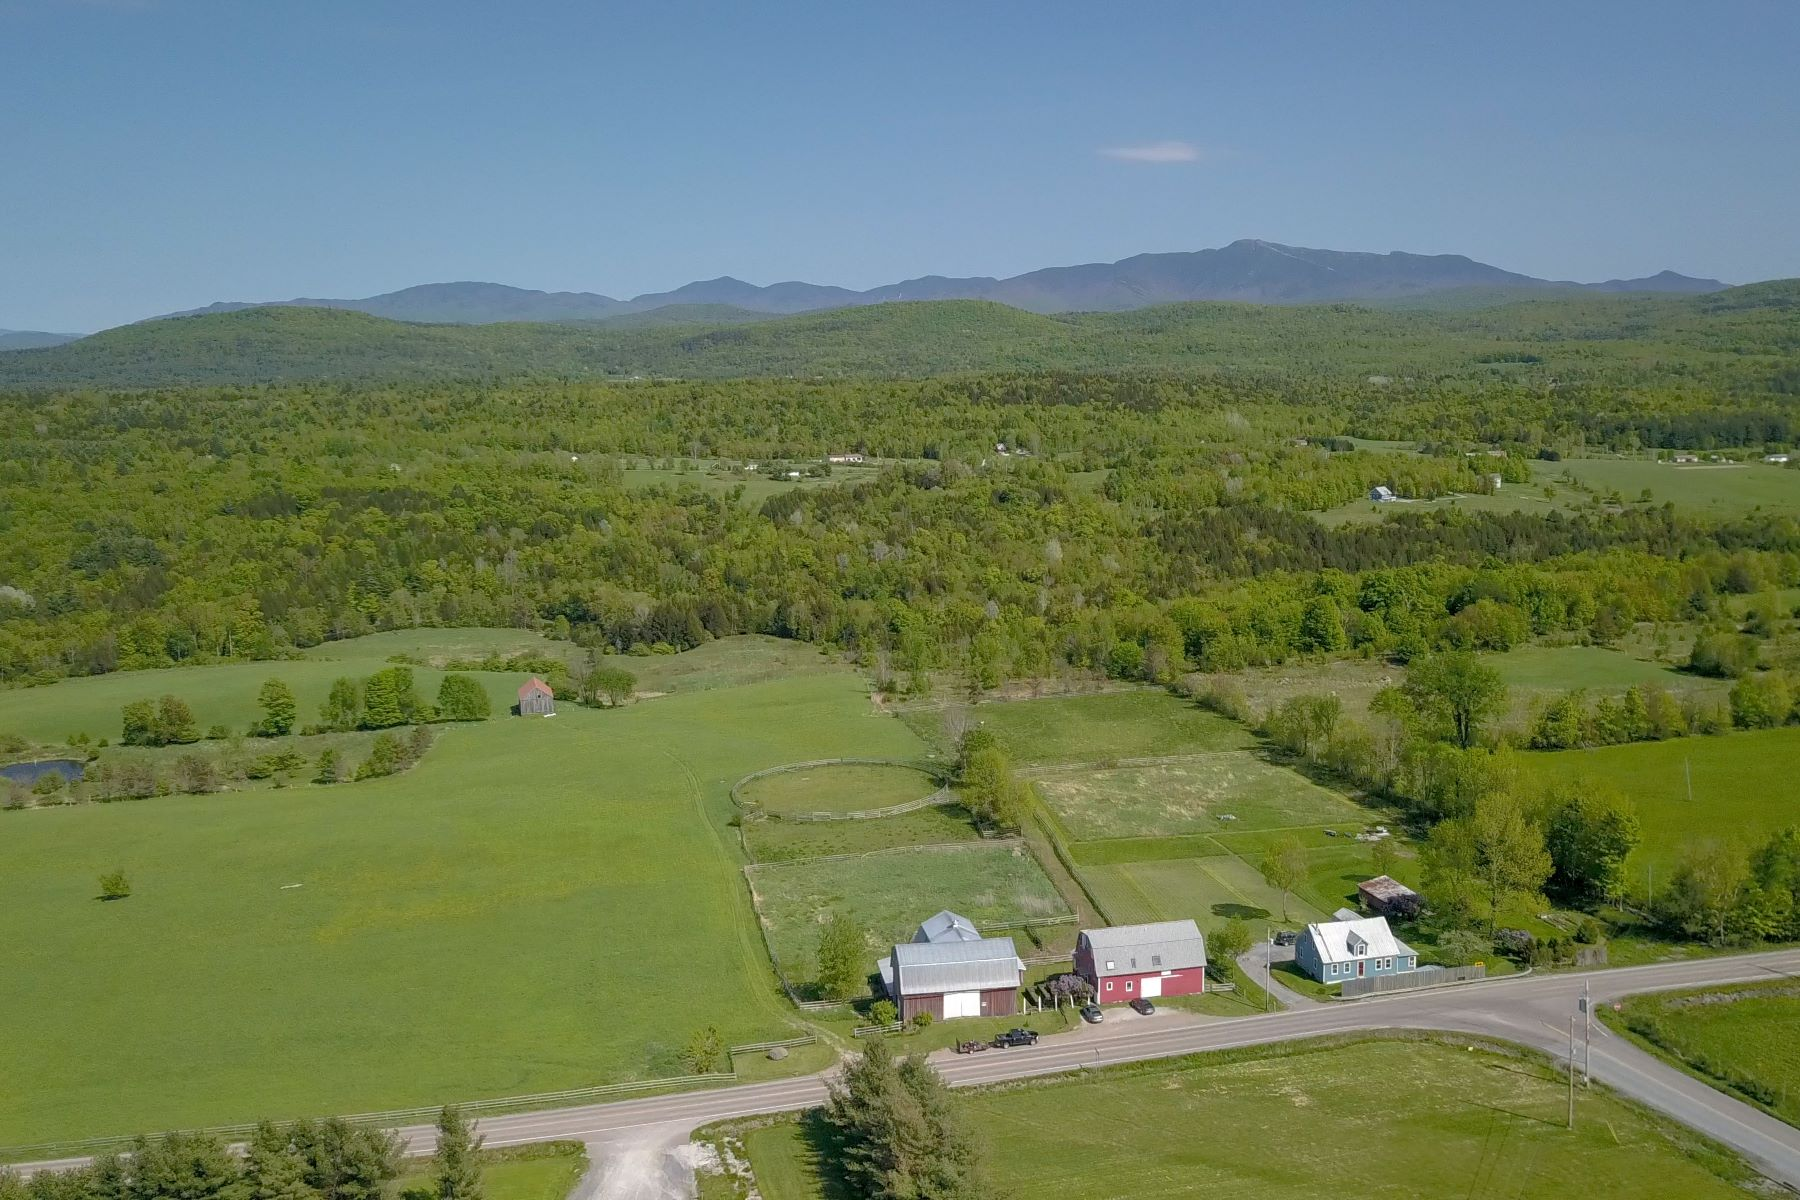 Single Family Home for Sale at 2105 Vt Rte 128, Westford 2105 Vt Rte 128 Westford, Vermont 05494 United States